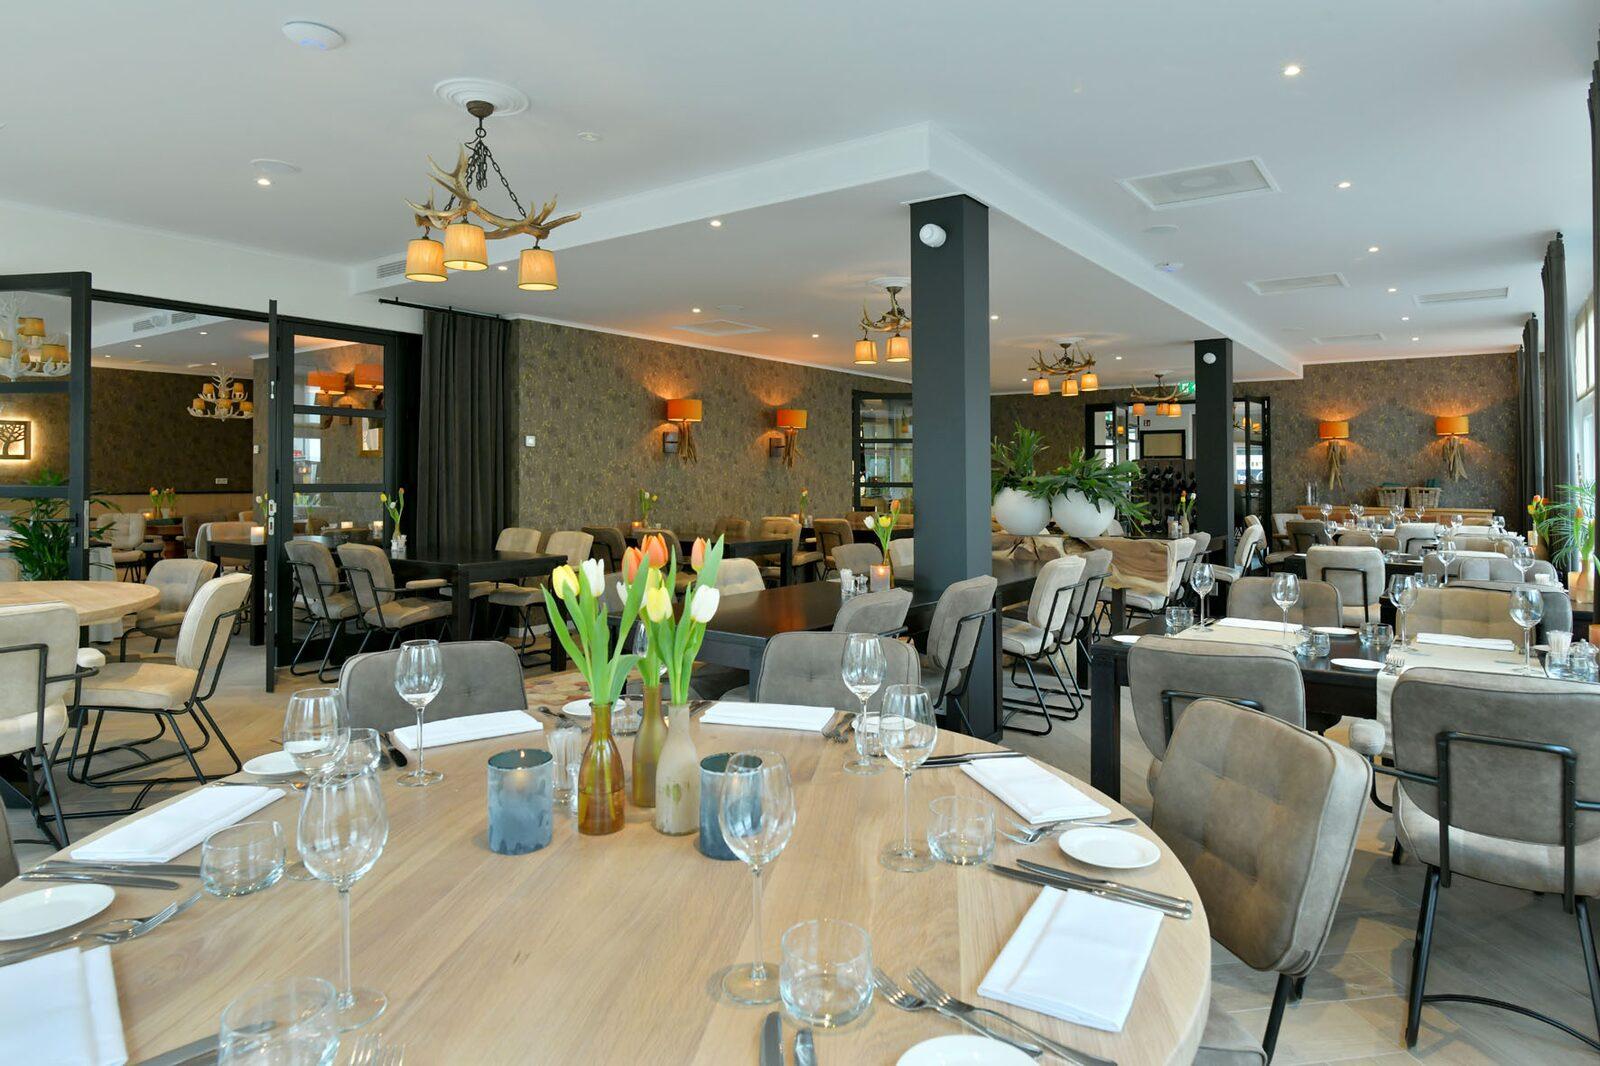 Forest restaurant Joppe